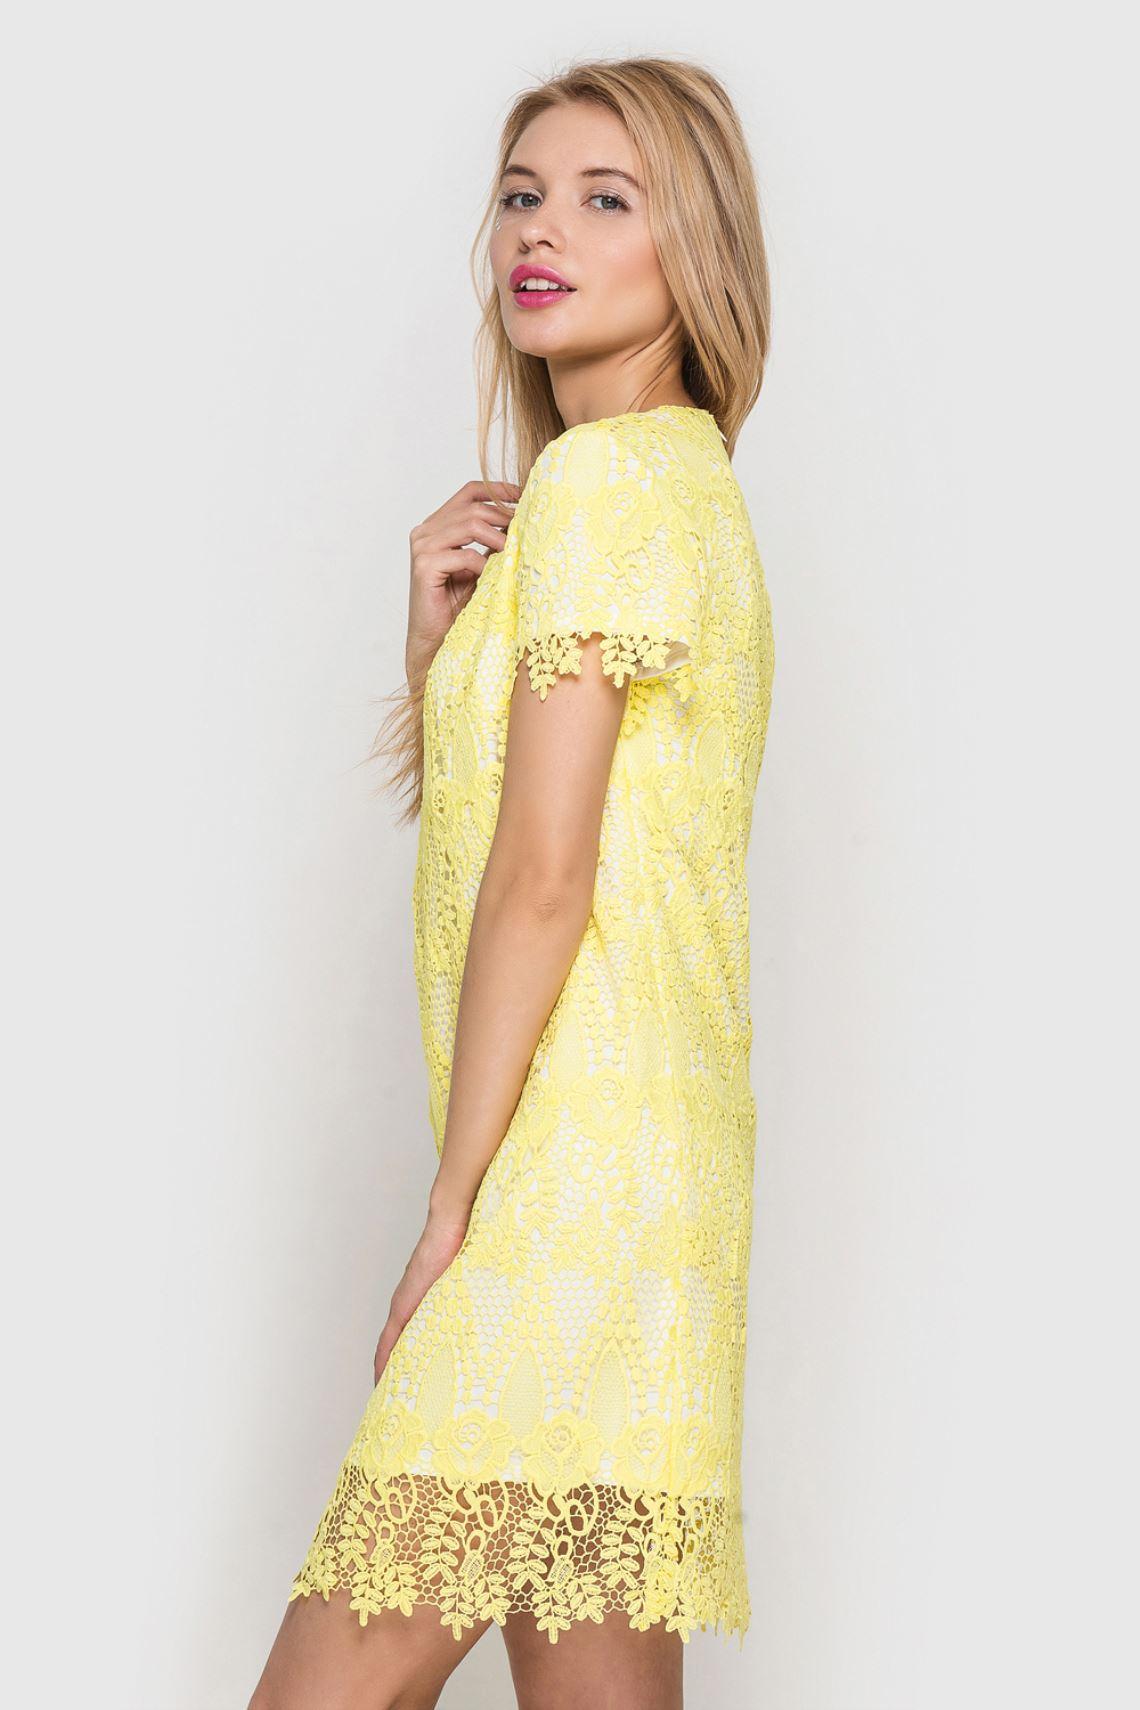 Сукня жовта з мережива  66ad57817ca0a